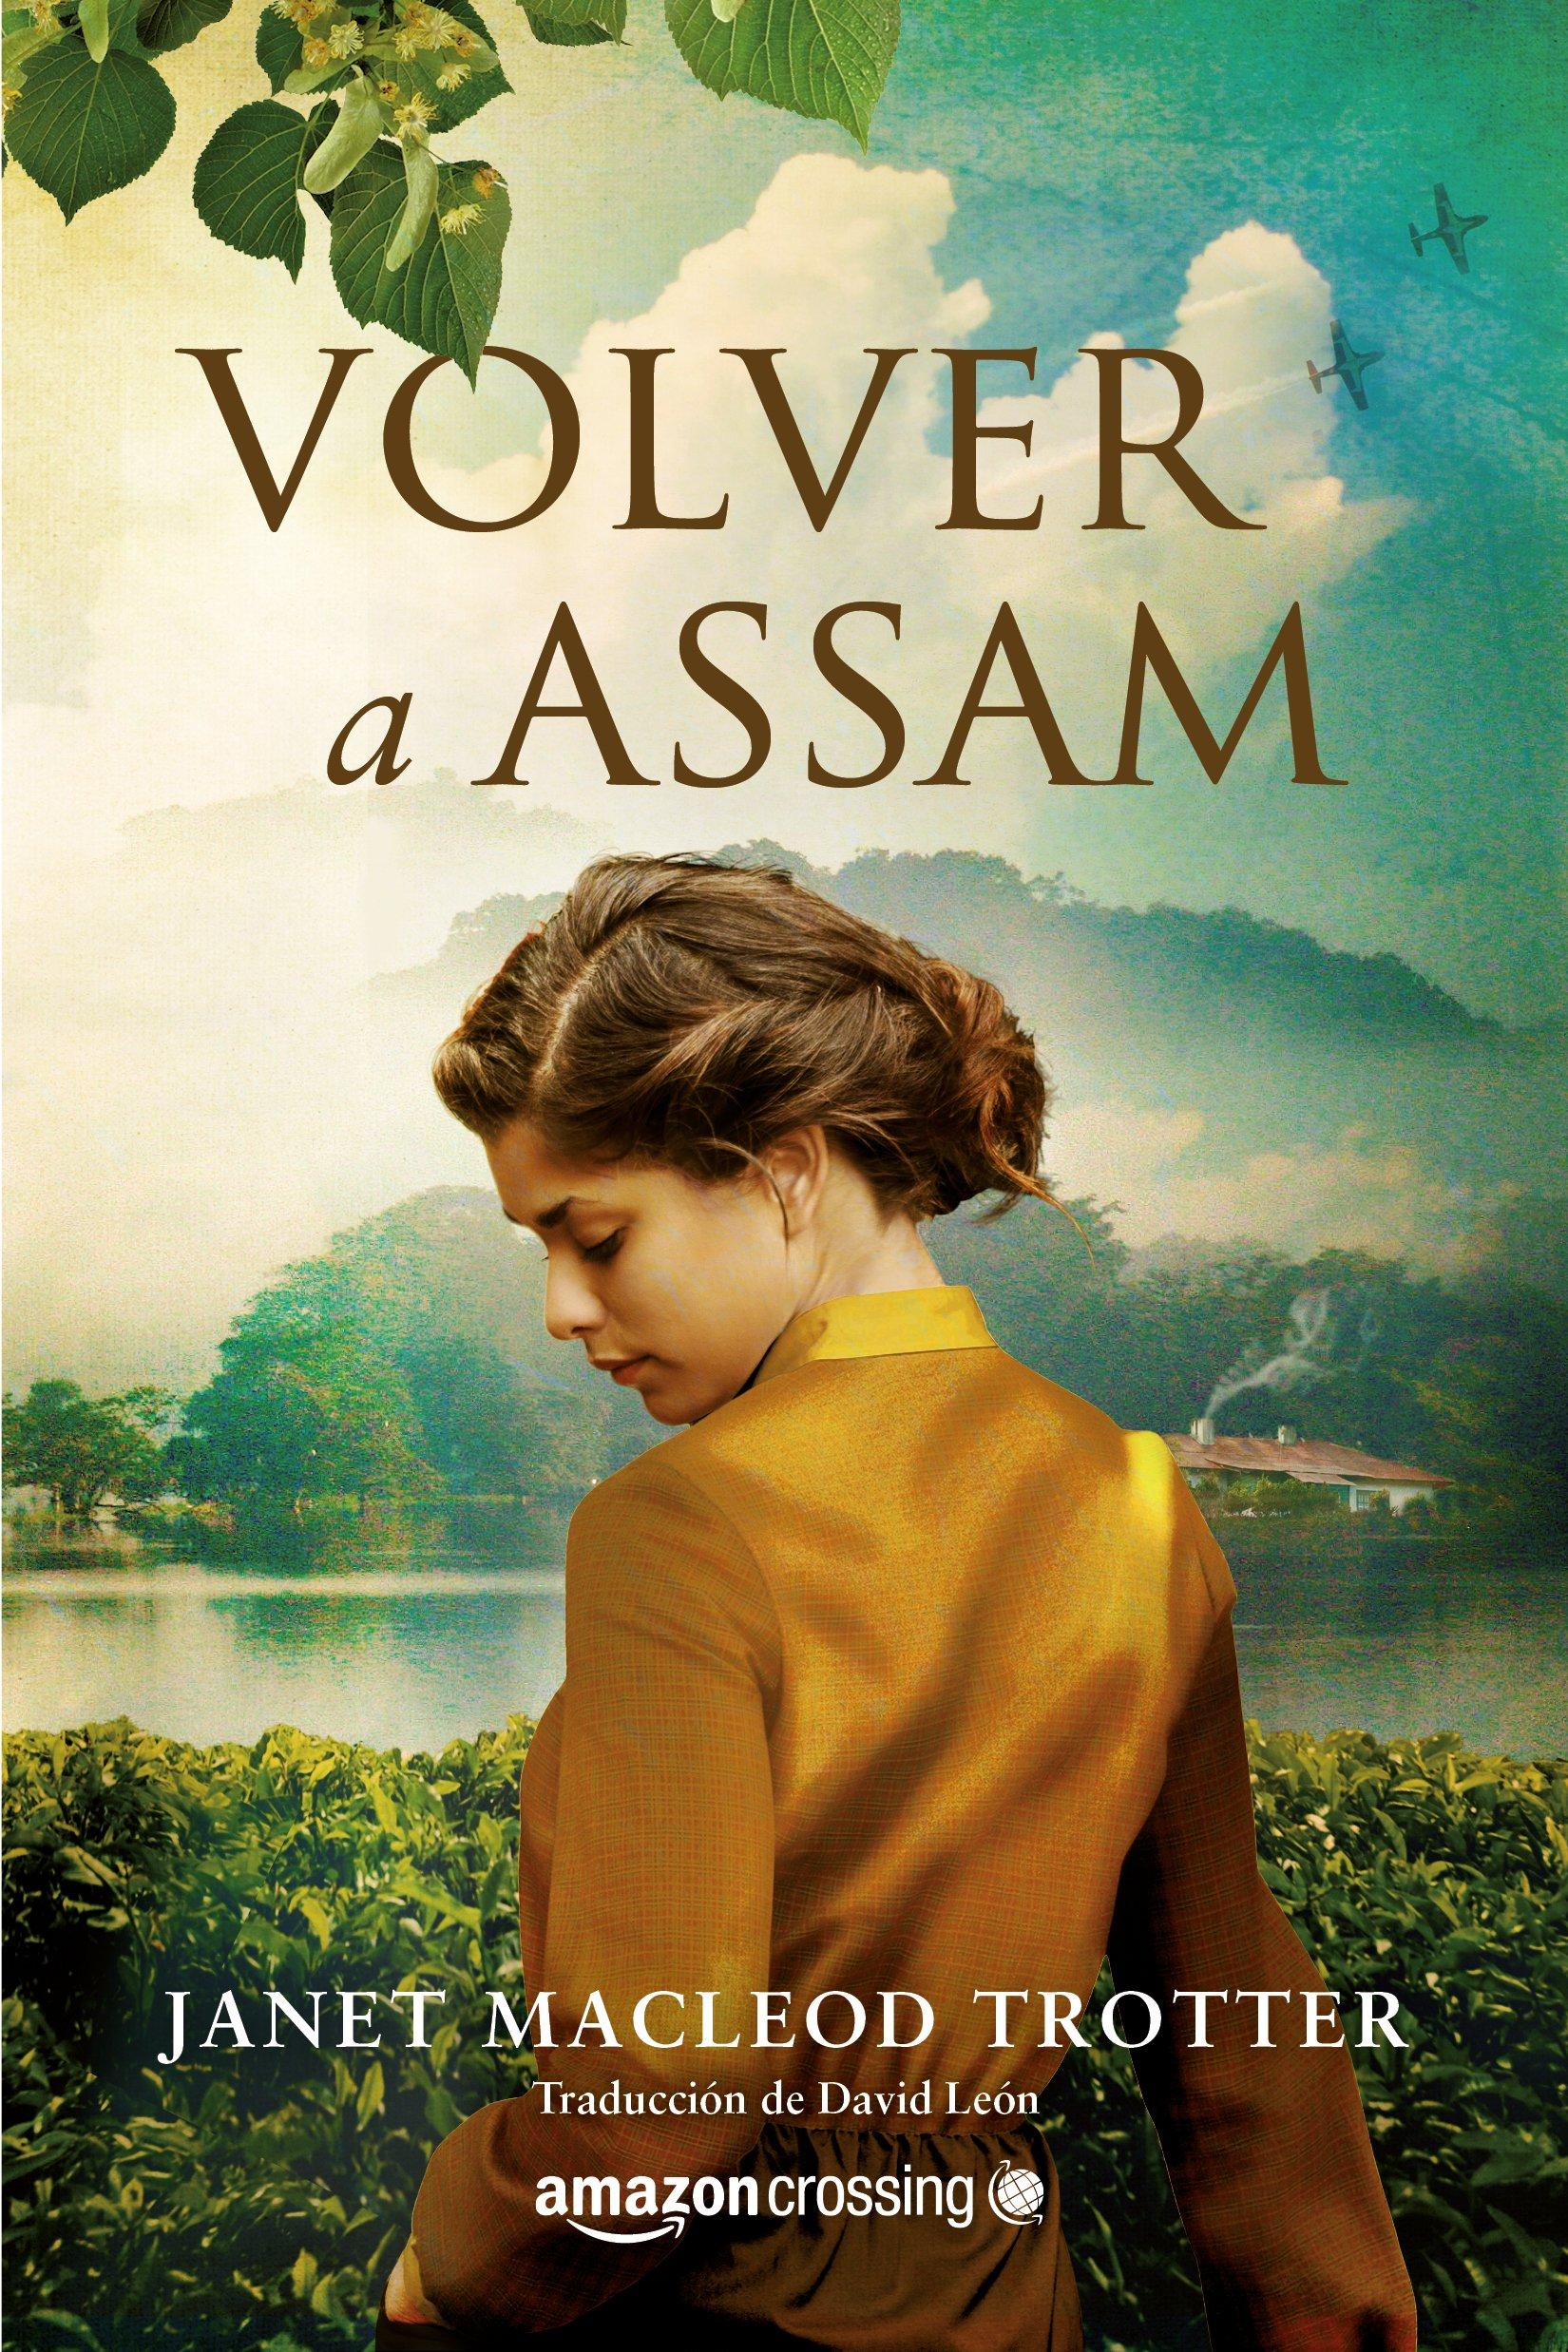 Volver a Assam (Aromas de té) Tapa blanda – 9 oct 2018 Janet MacLeod Trotter David León AmazonCrossing 2919803344